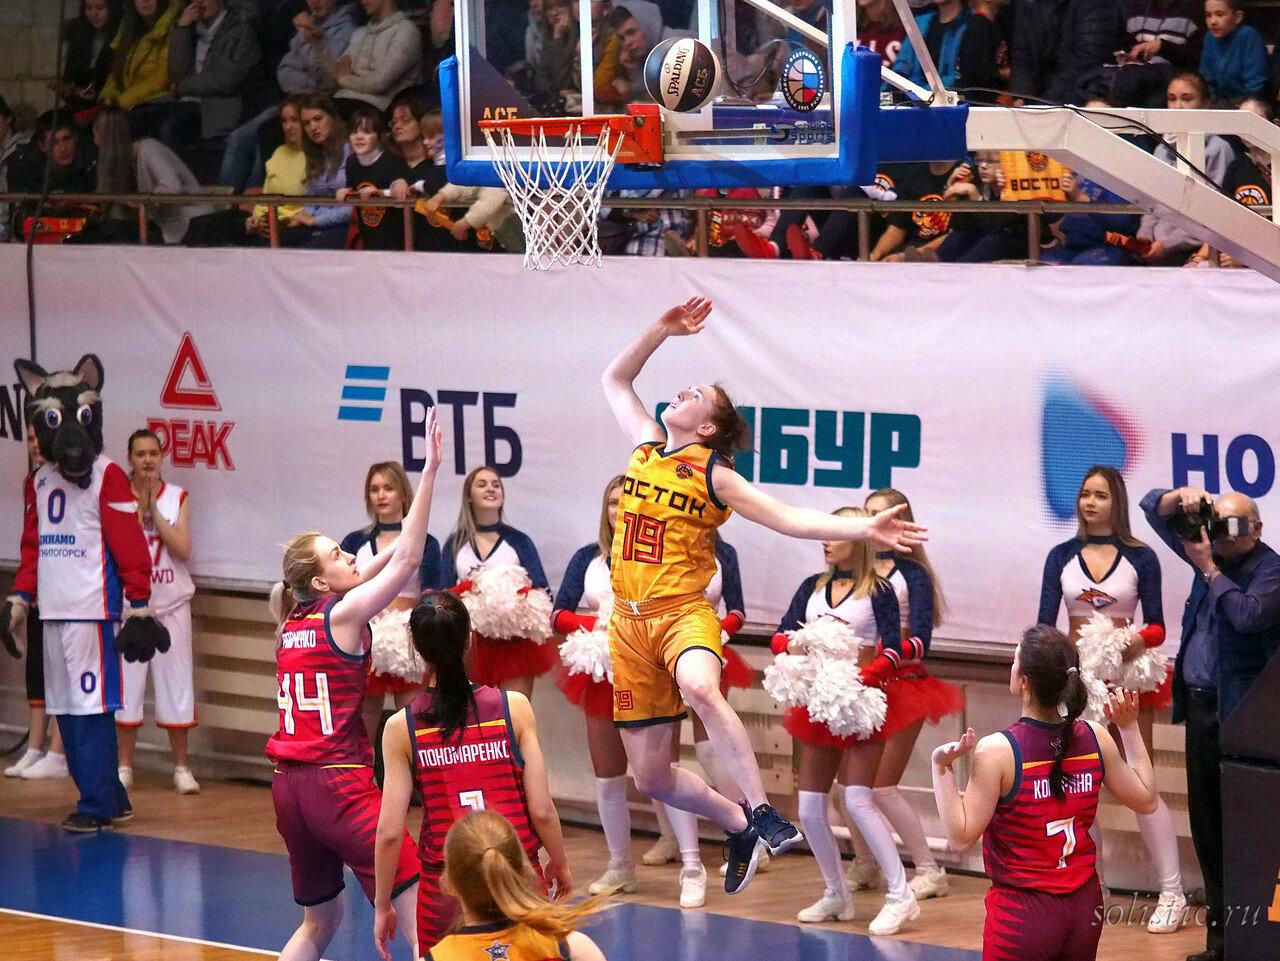 103 Матч звезд АСБ 2018 (ассоциации студенческого баскетбола)